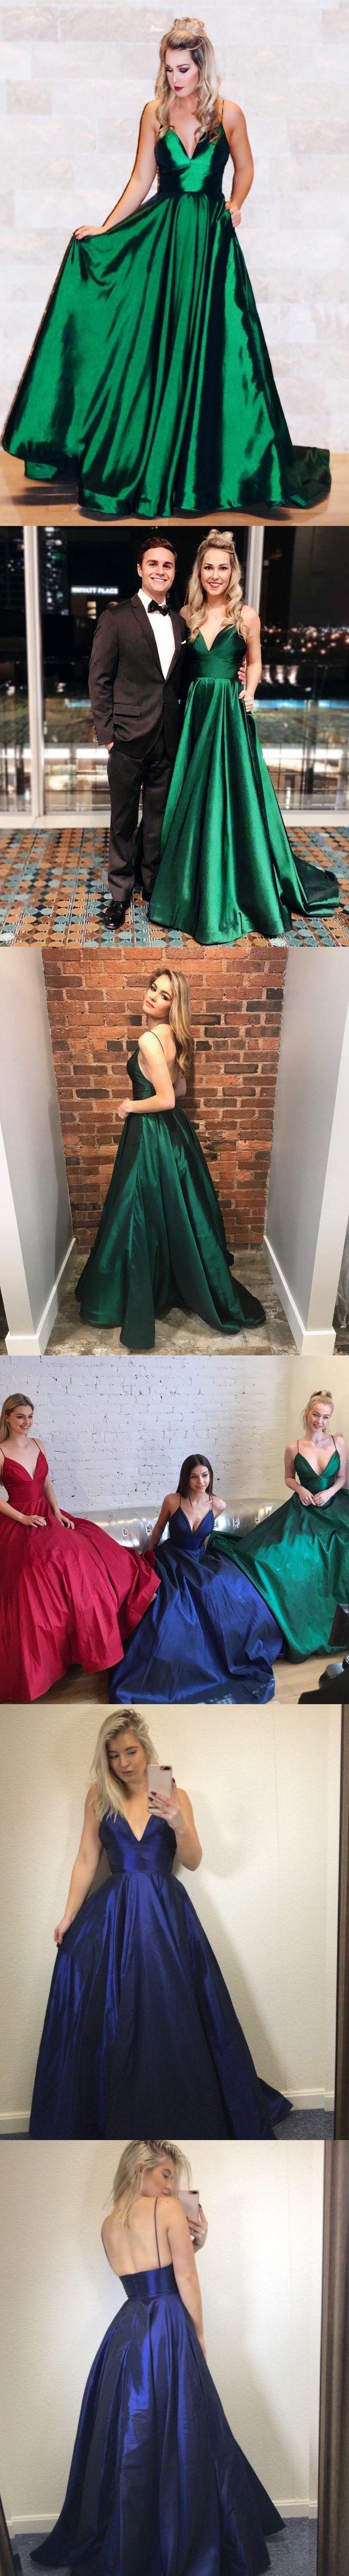 Cheap prom dresses aline spaghetti straps simple prom dress long